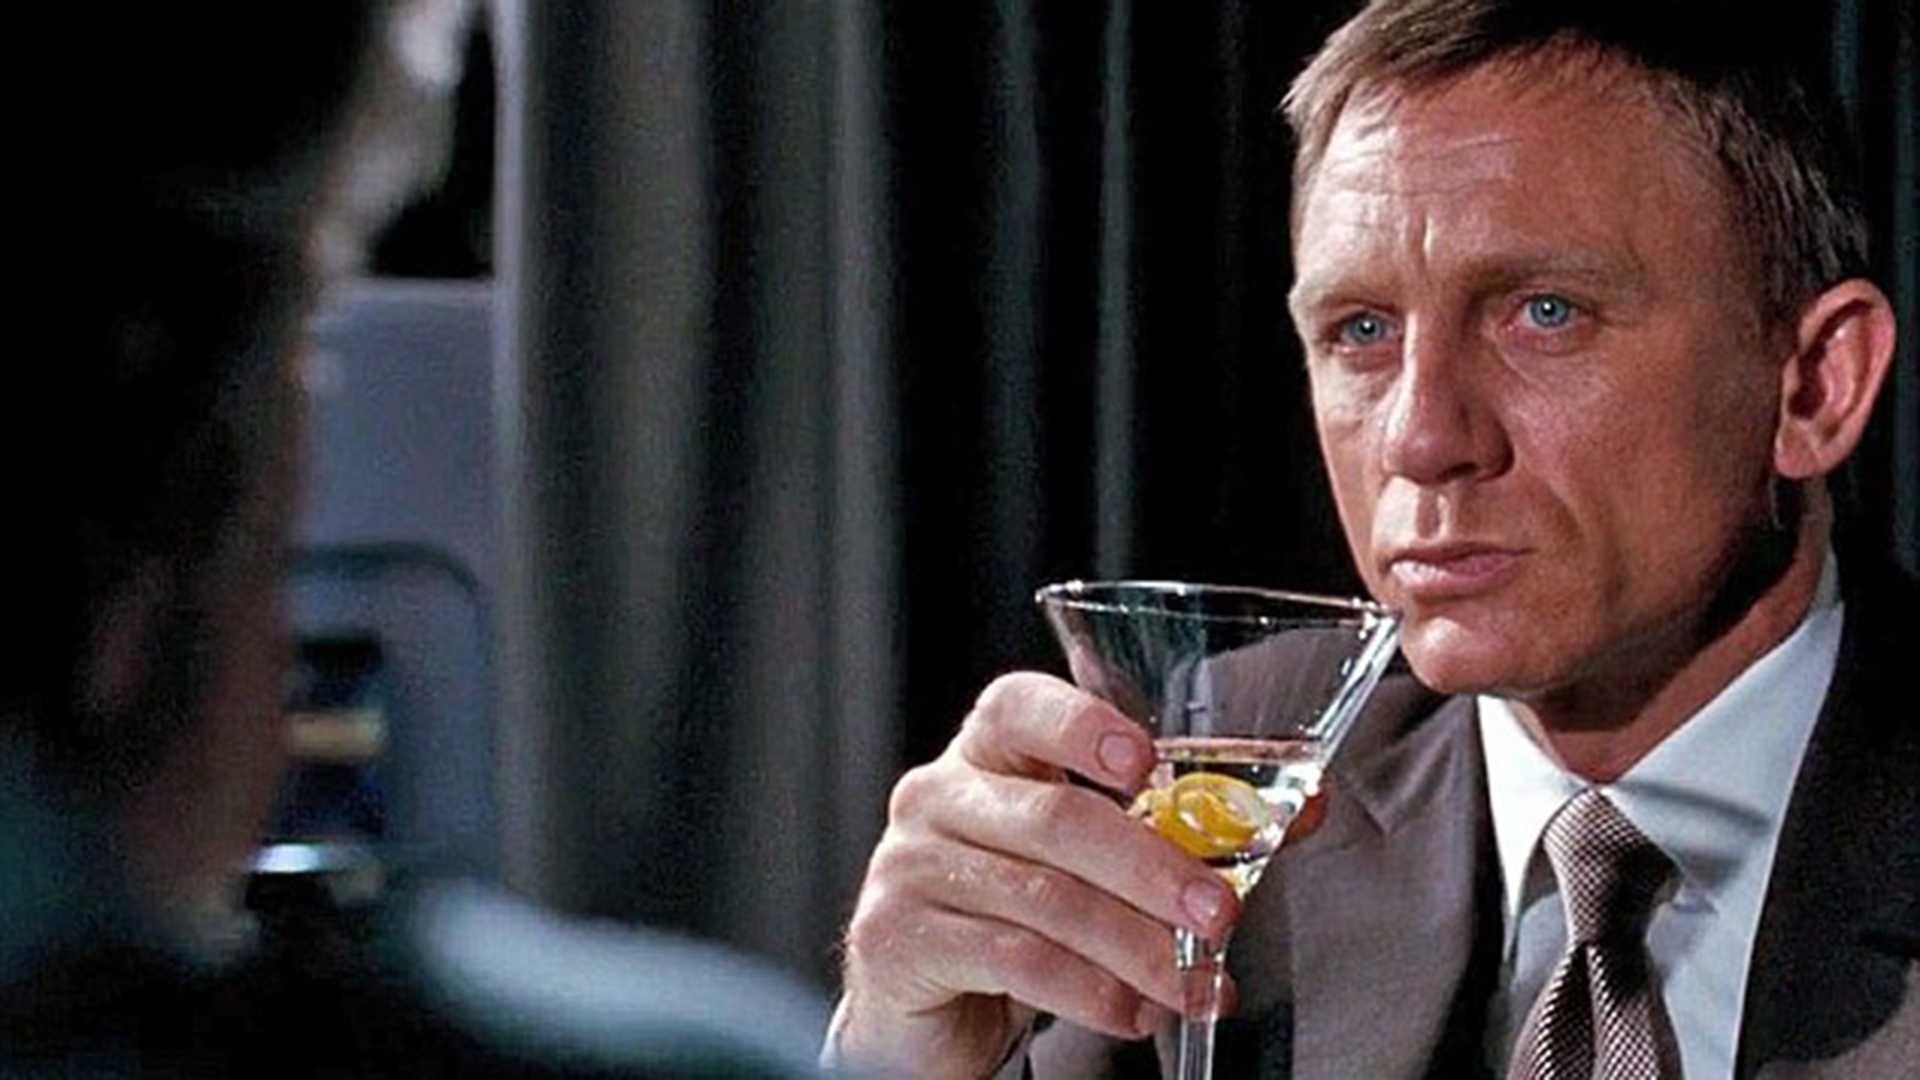 James Bond has 'severe chronic alcohol problem,' according to health experts